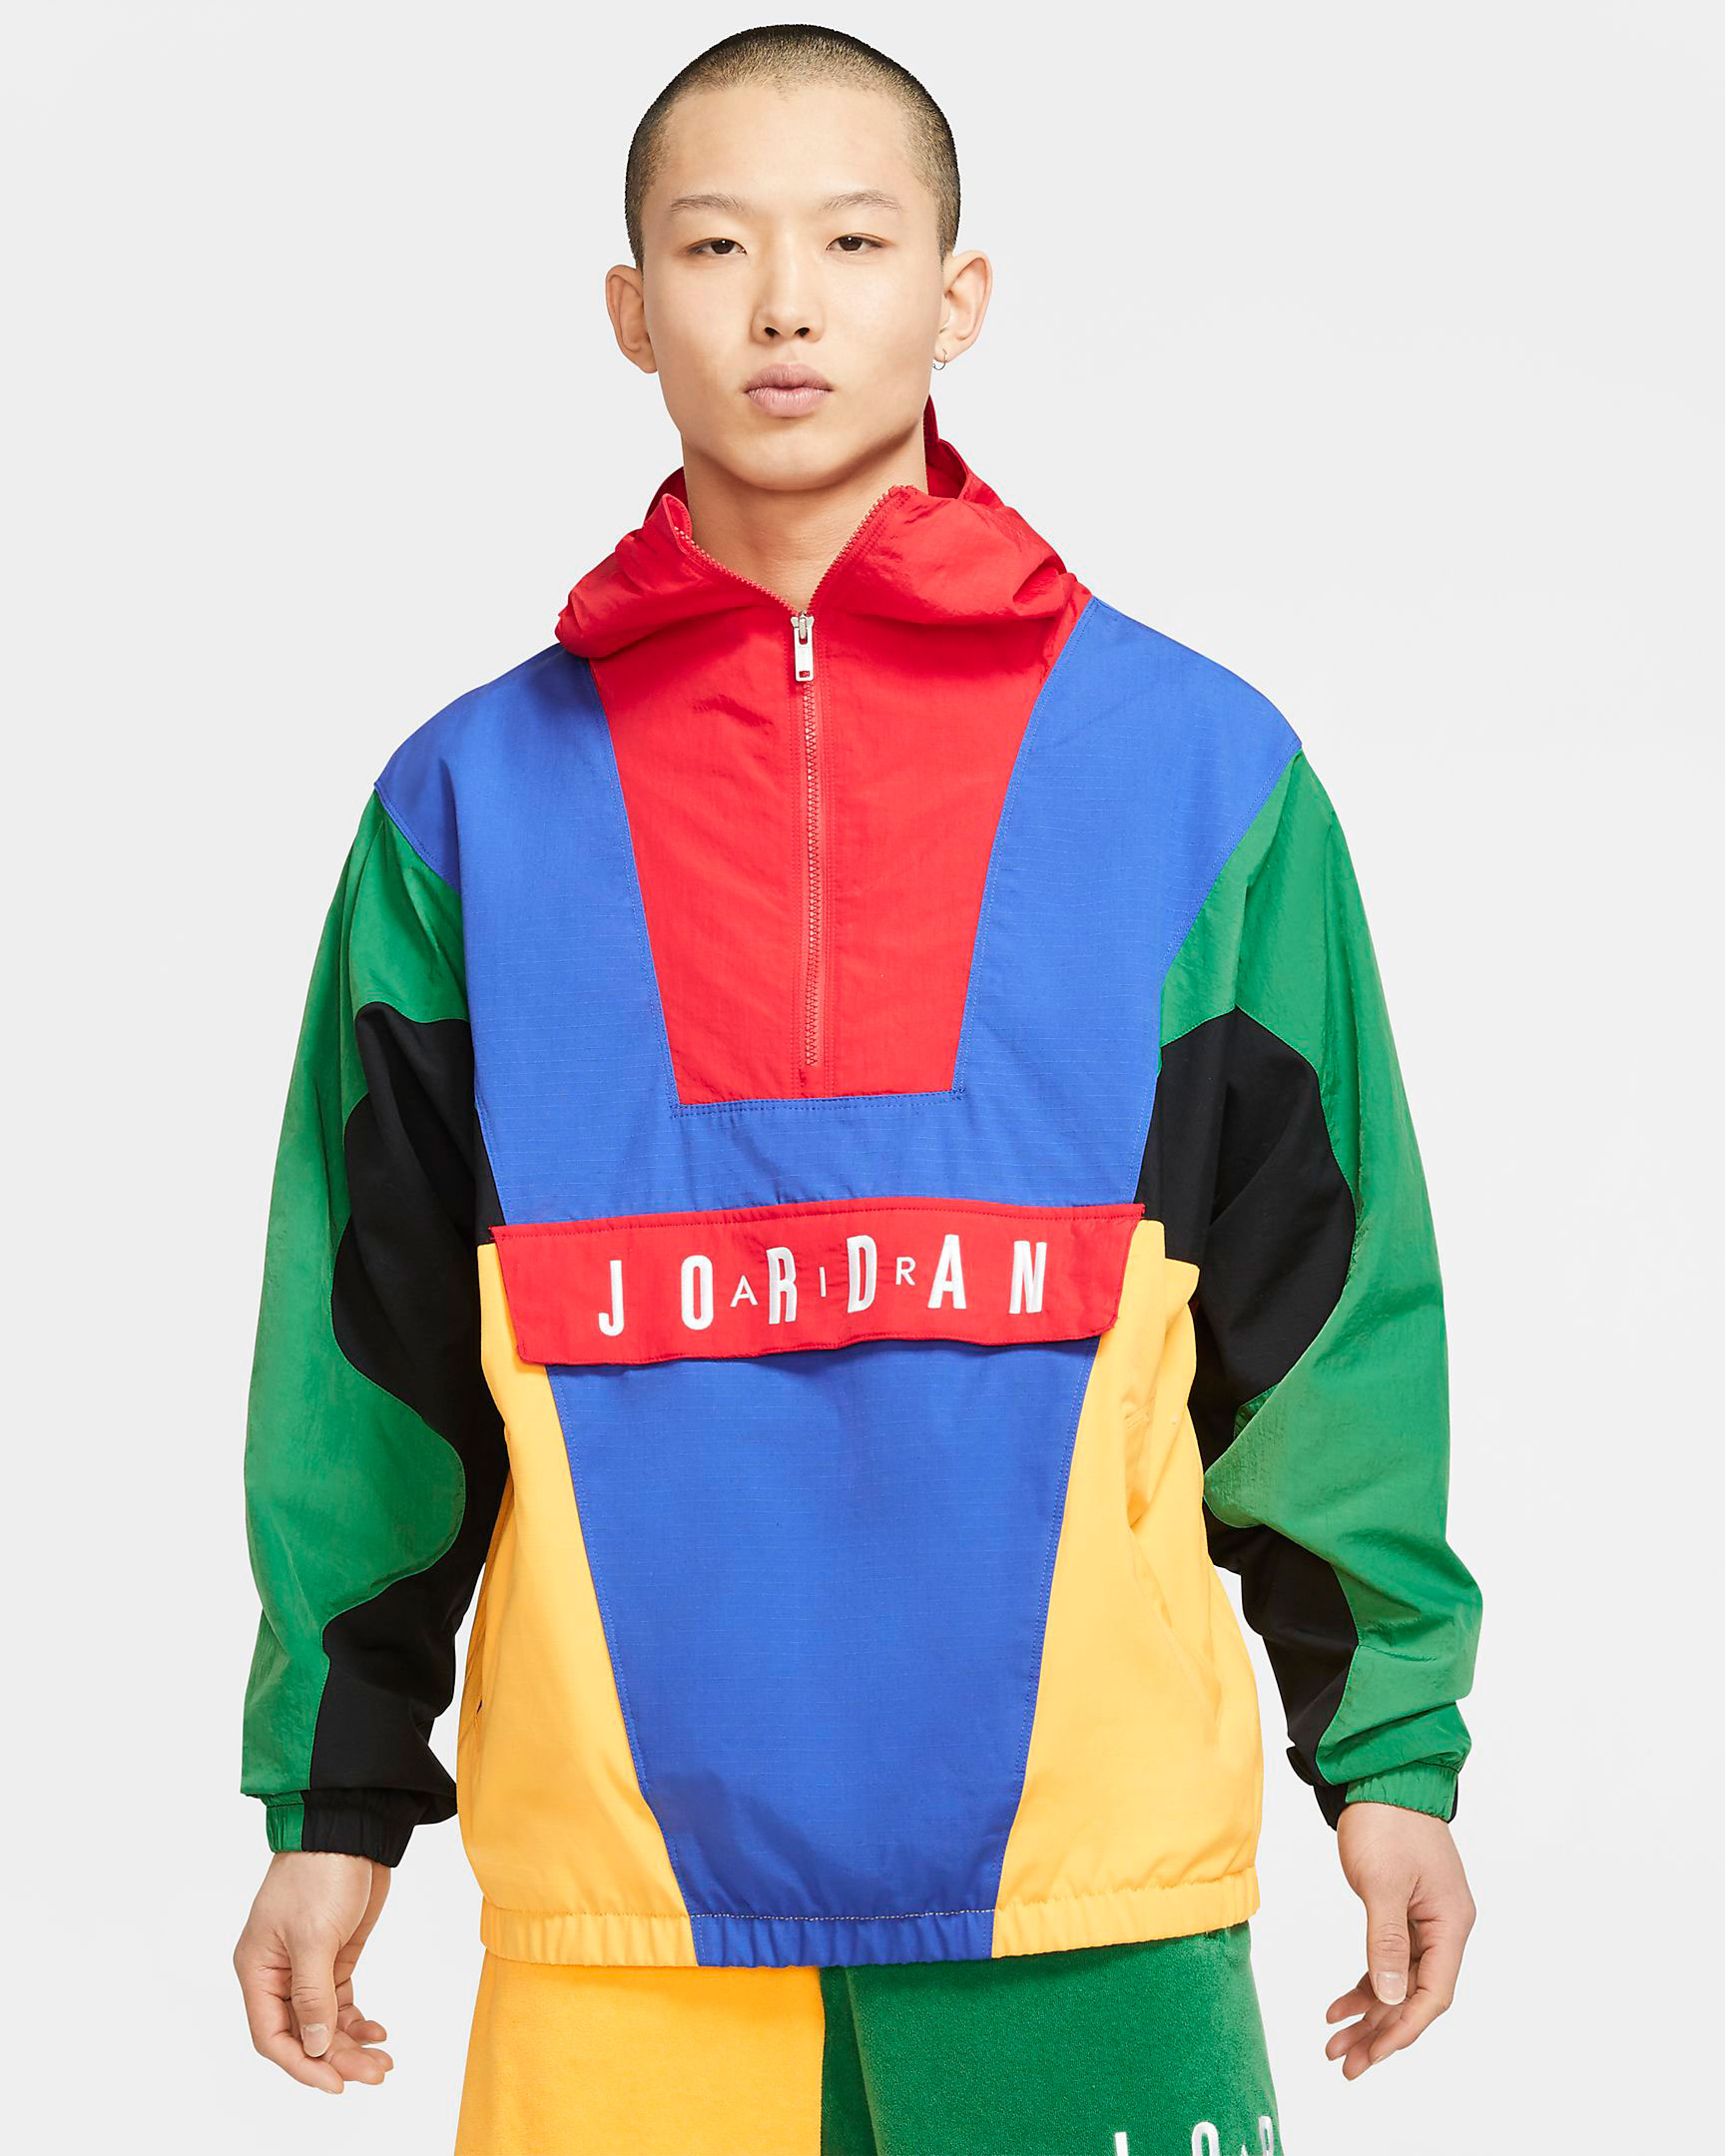 jordan-6-hare-jacket-match-1